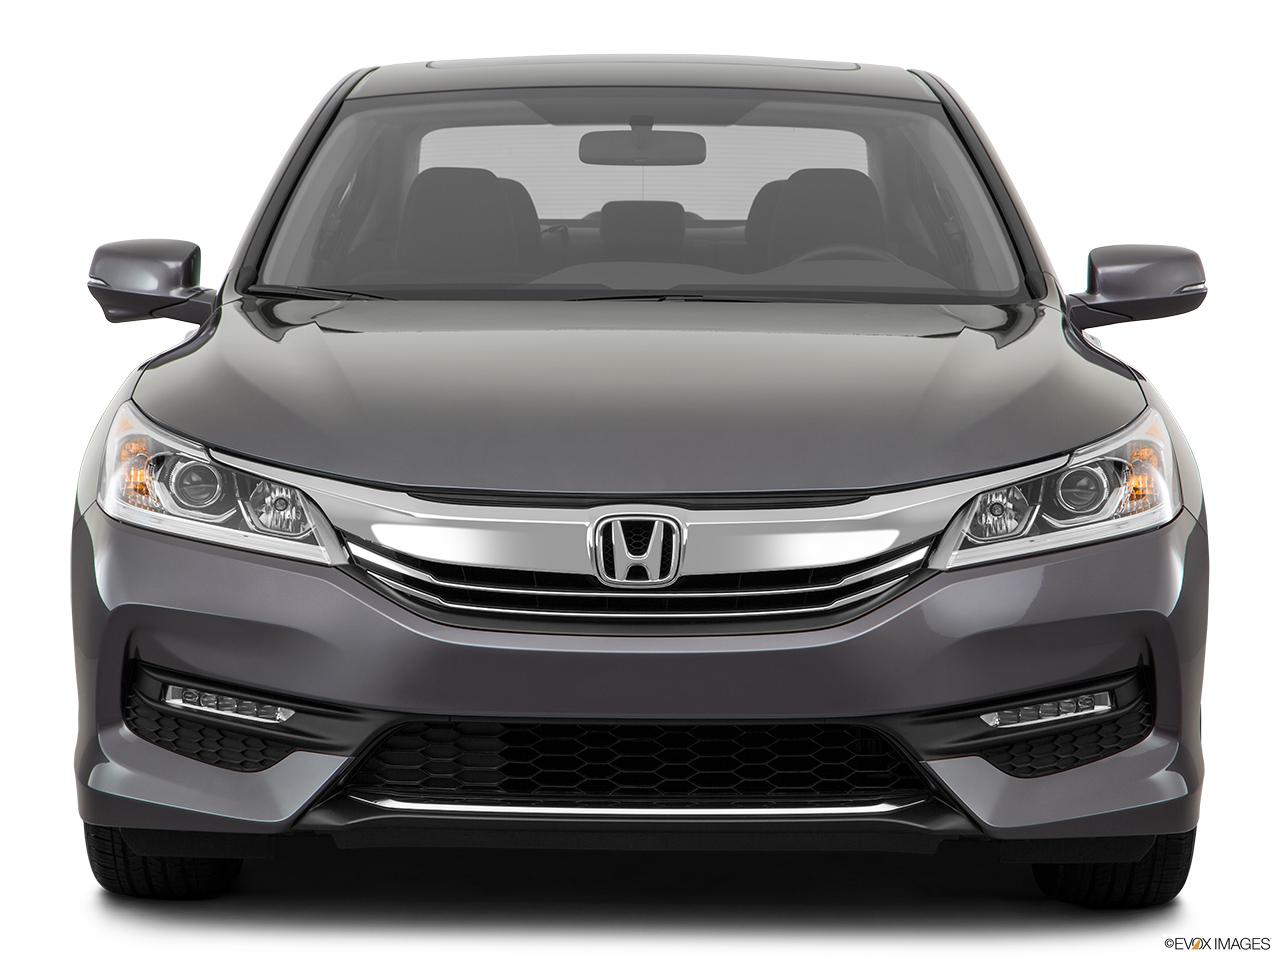 Honda Accord 2017 2.4L LX Plus in UAE: New Car Prices, Specs, Reviews & Photos | YallaMotor